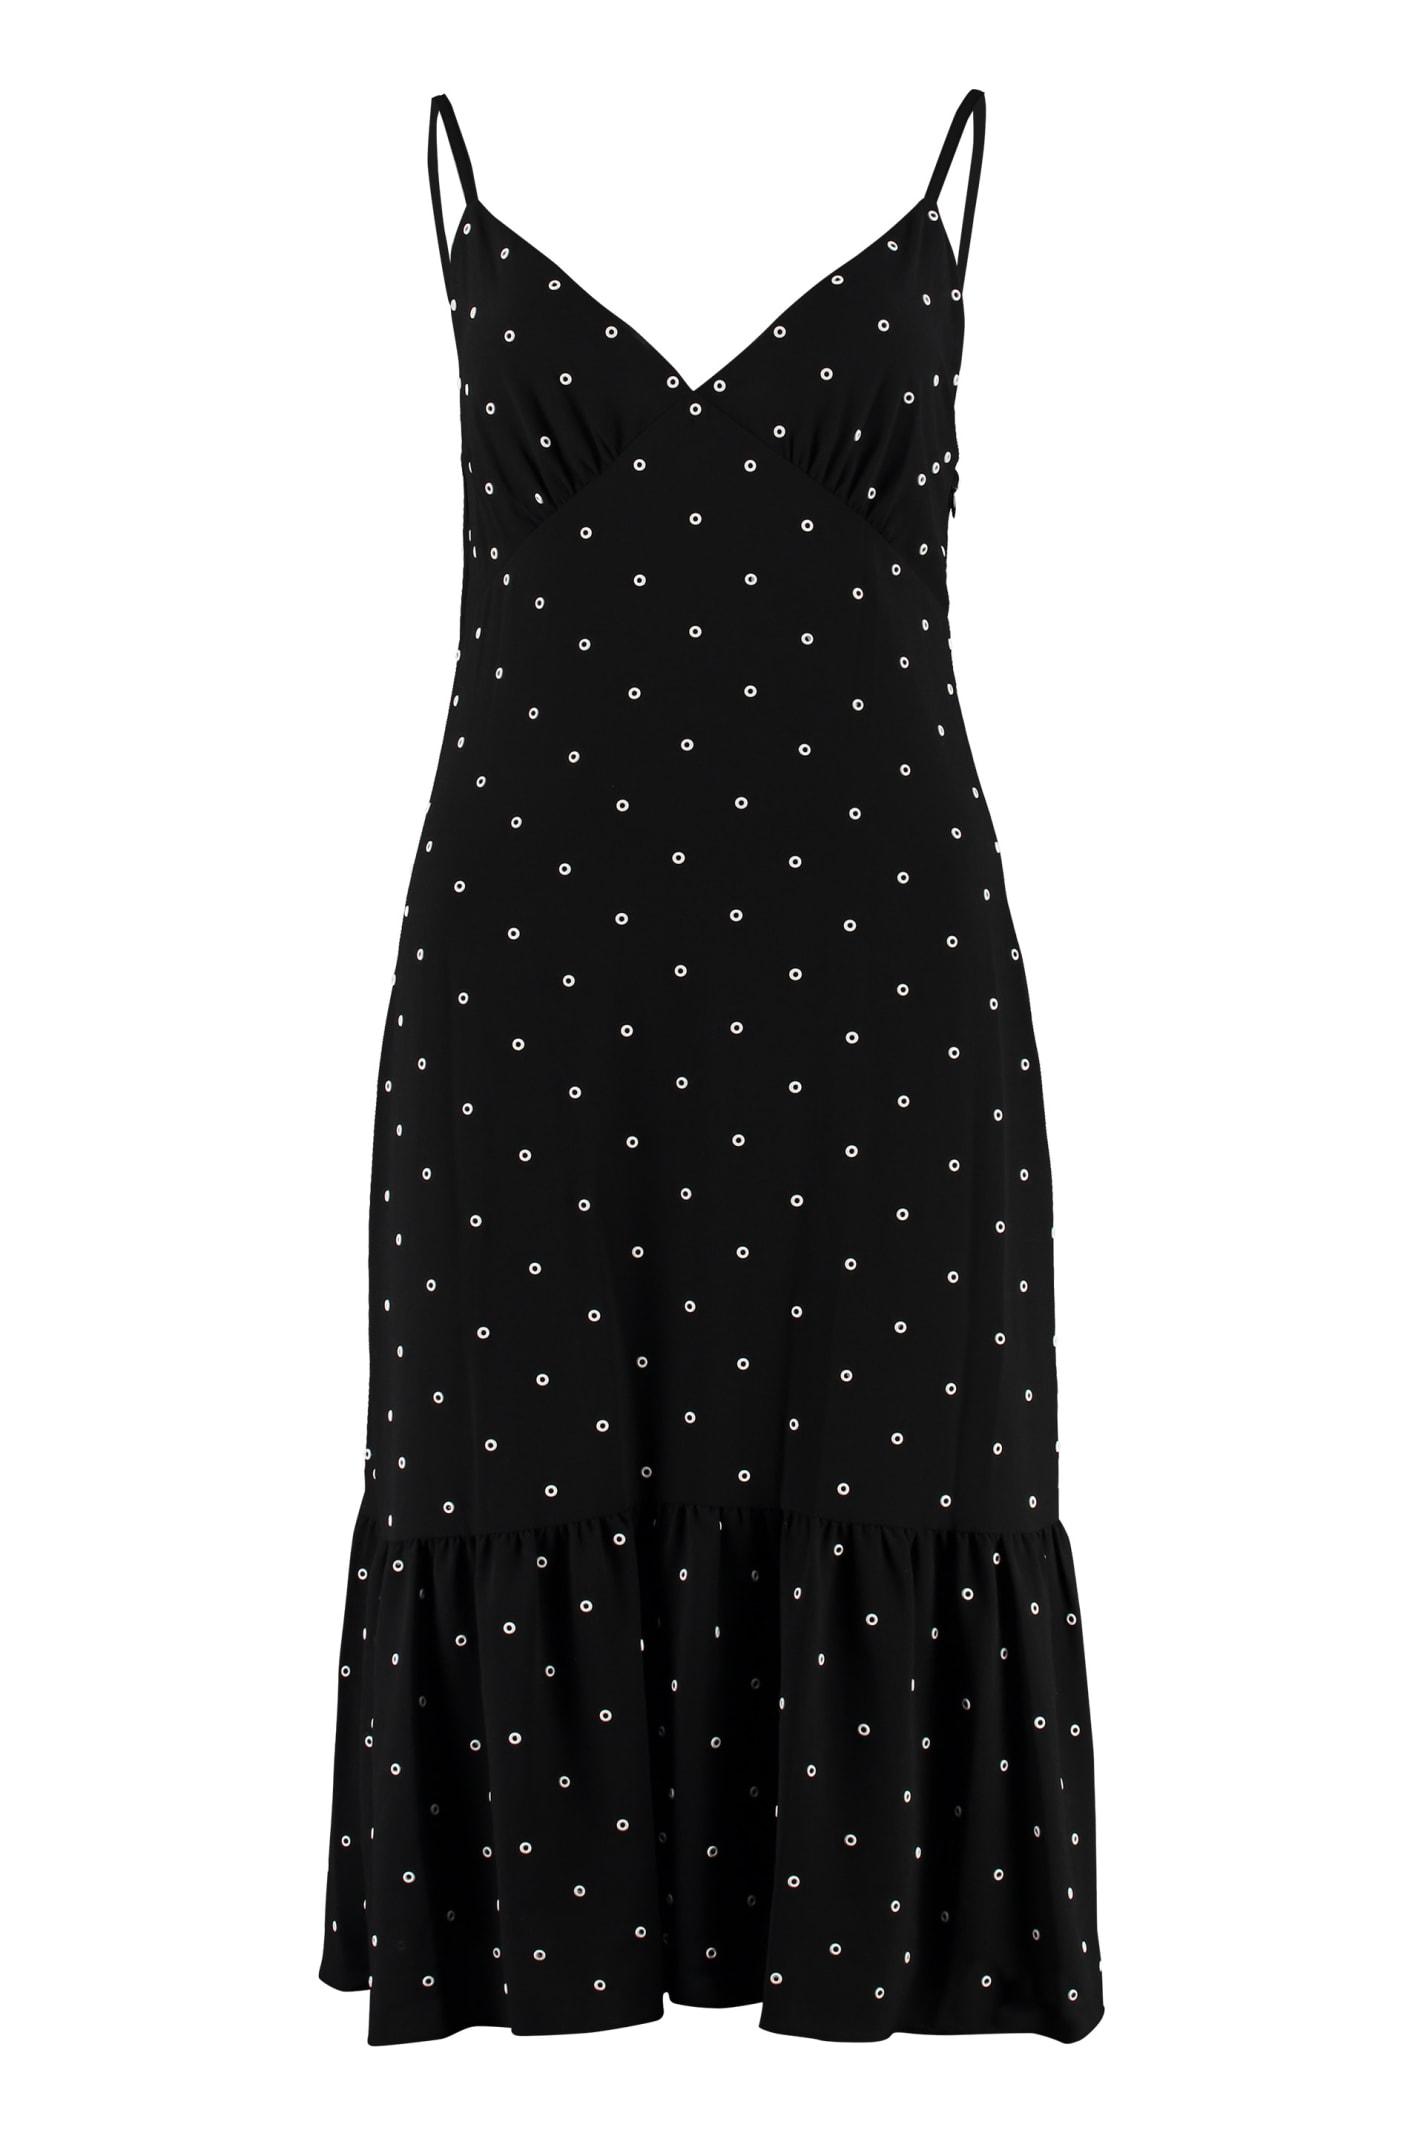 Michael Kors Crepe Slip-dress